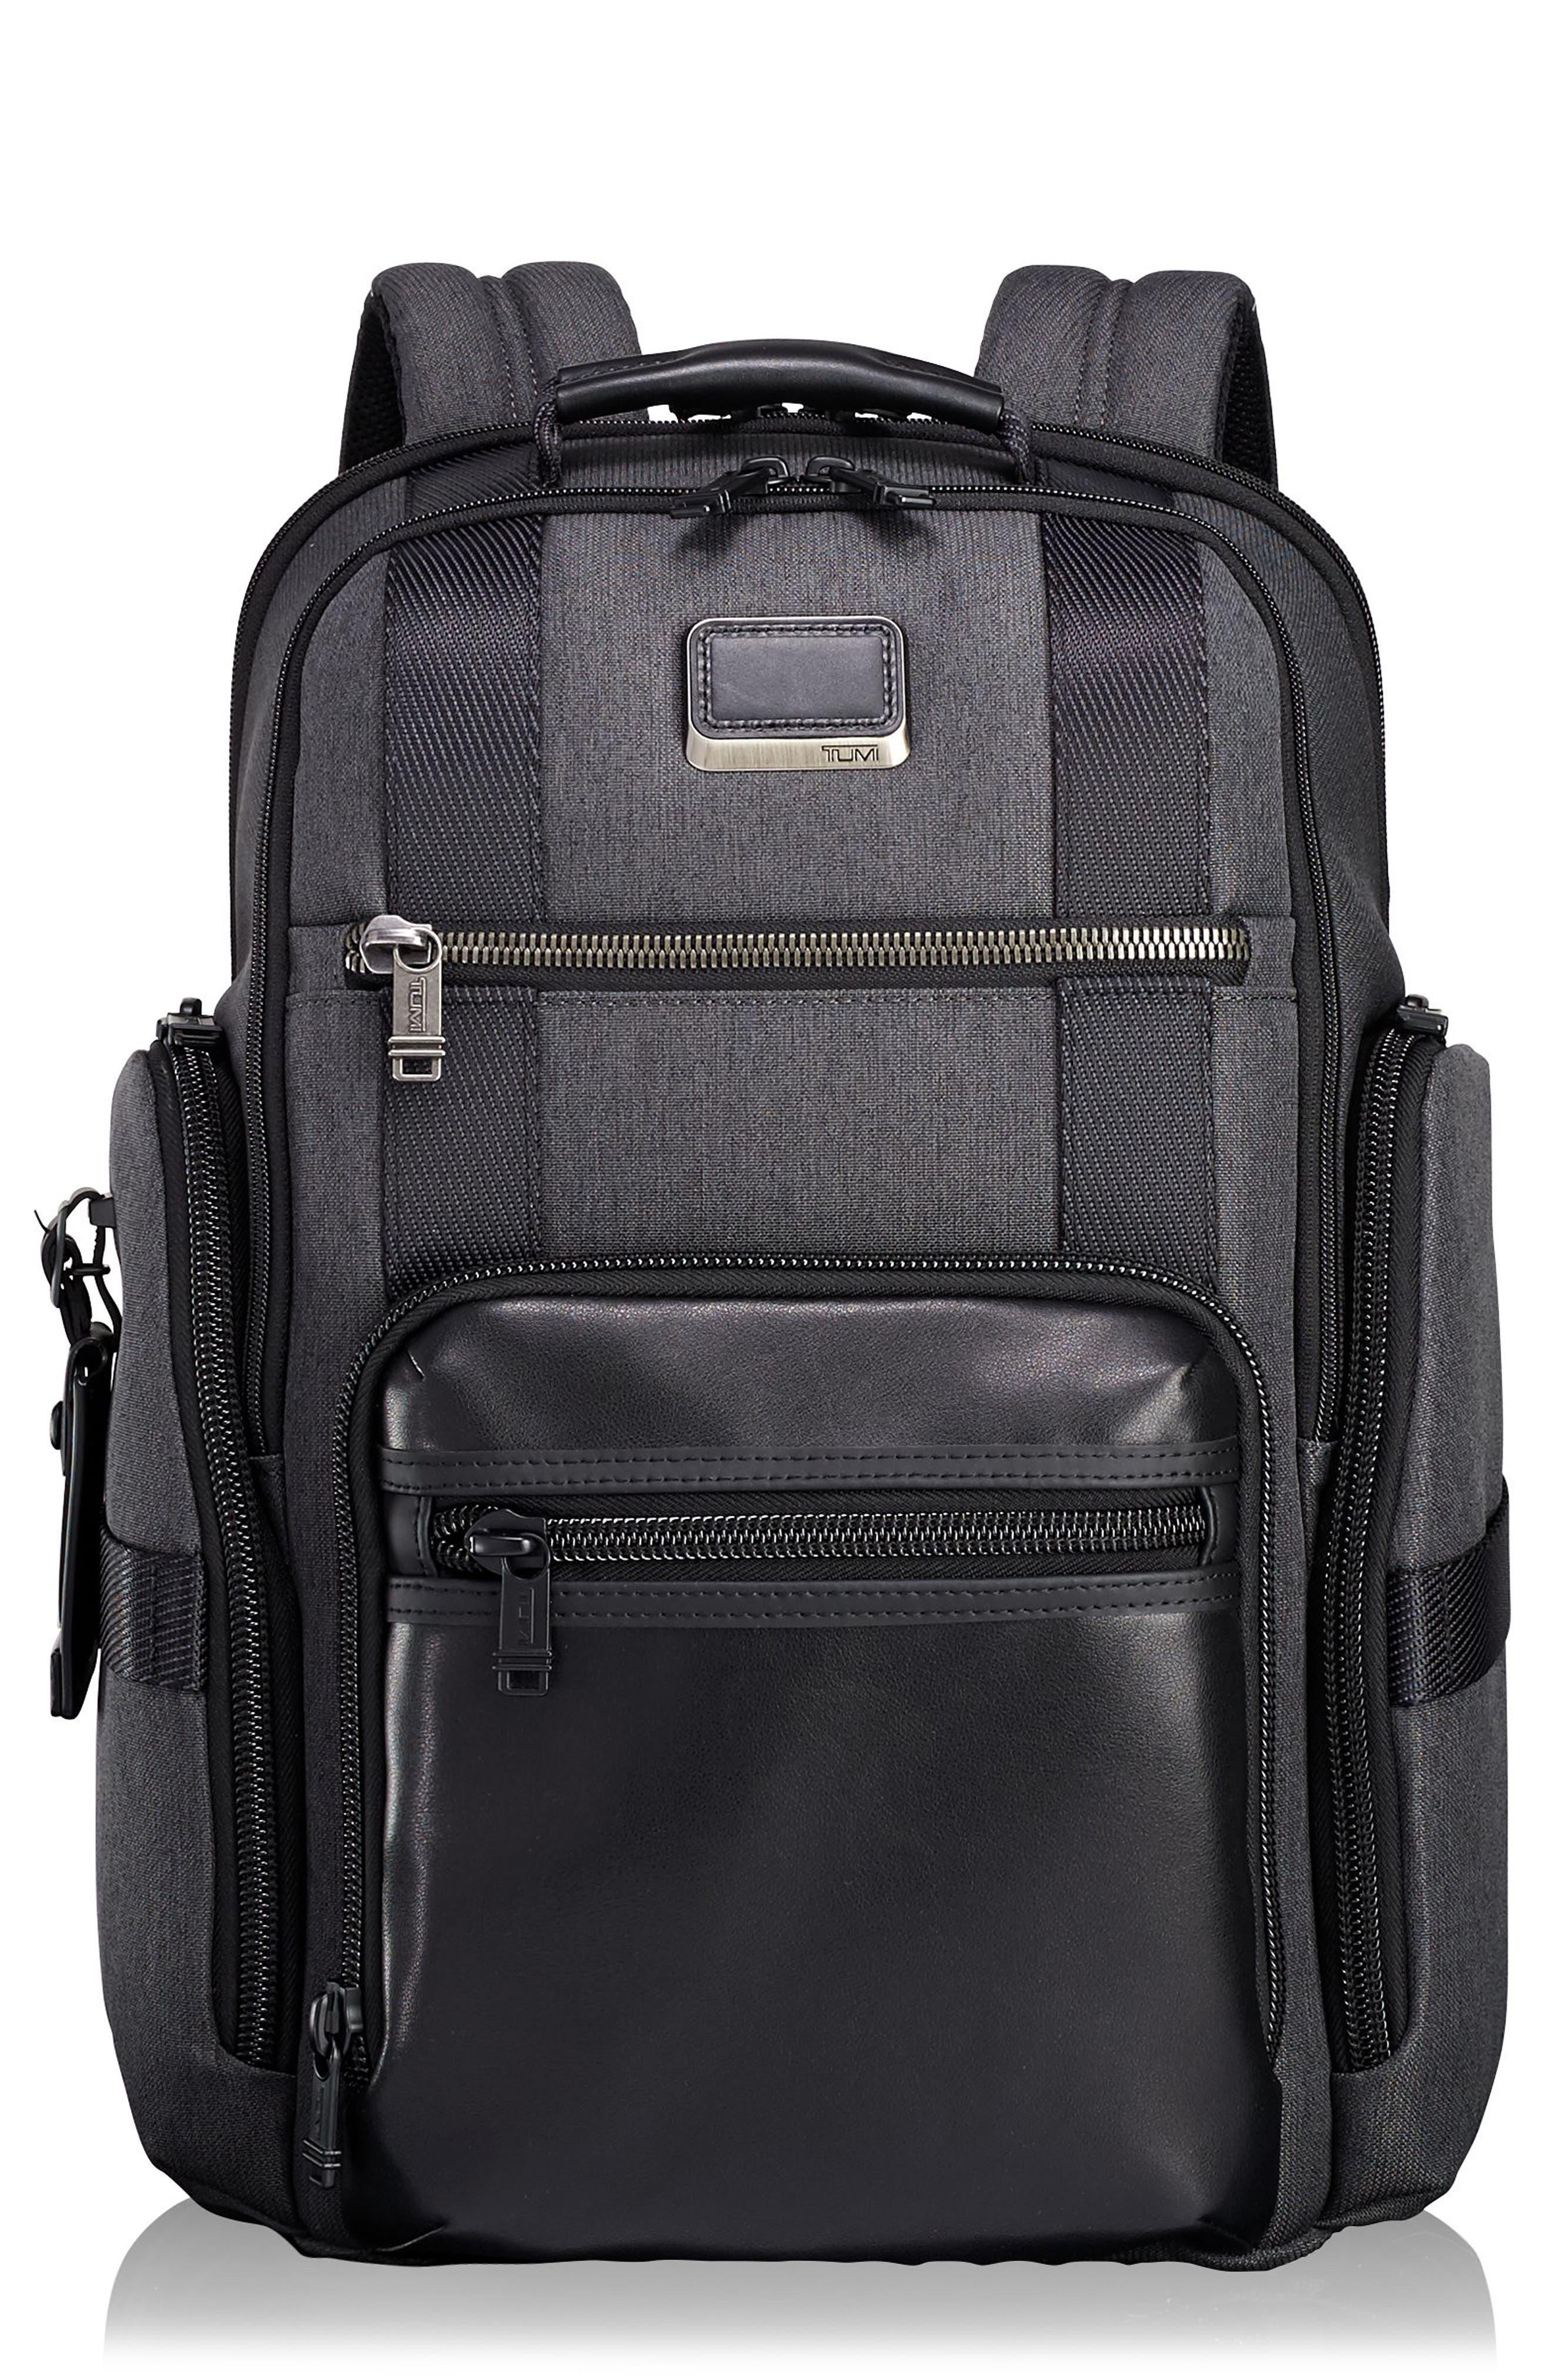 Grey Tumi Backpacks & Luggage | Nordstrom